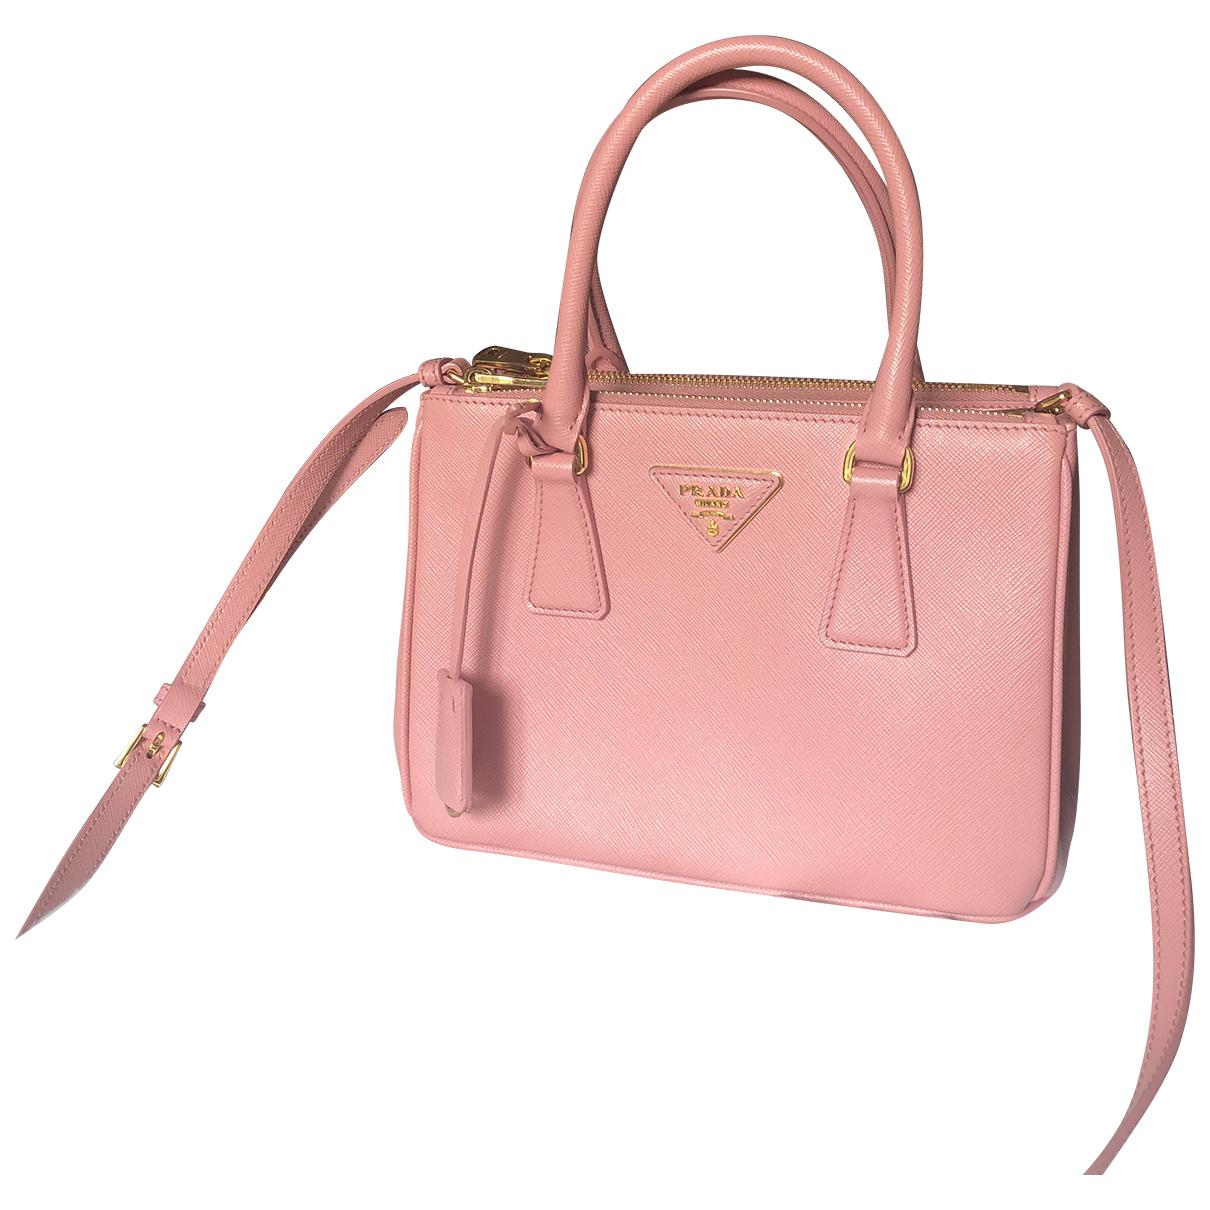 Prada Galleria Pink Leather handbag for Women \N